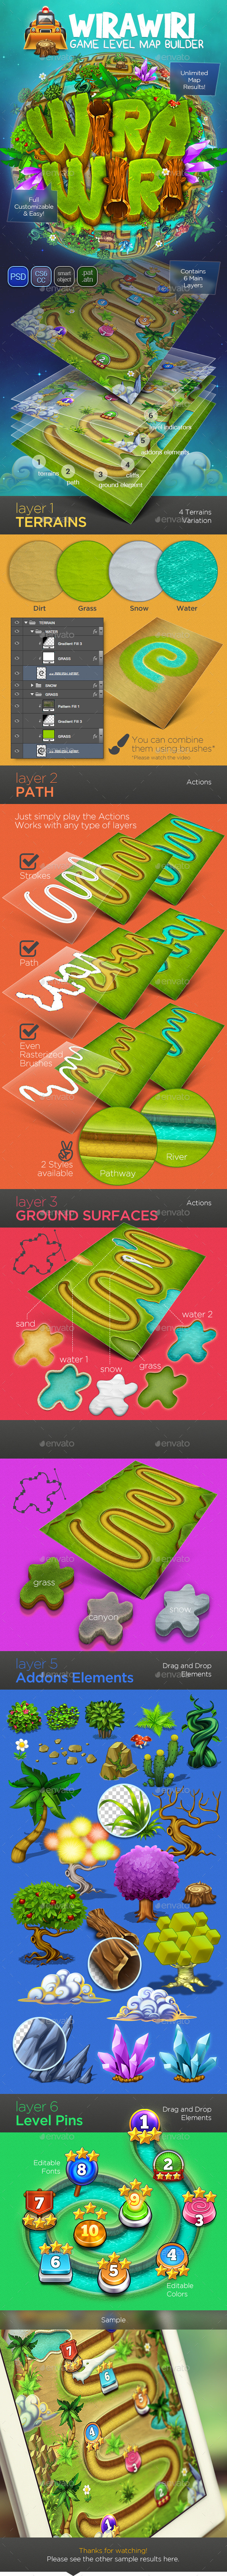 Wirawiri: Game Level Map Builder (Game Kits)